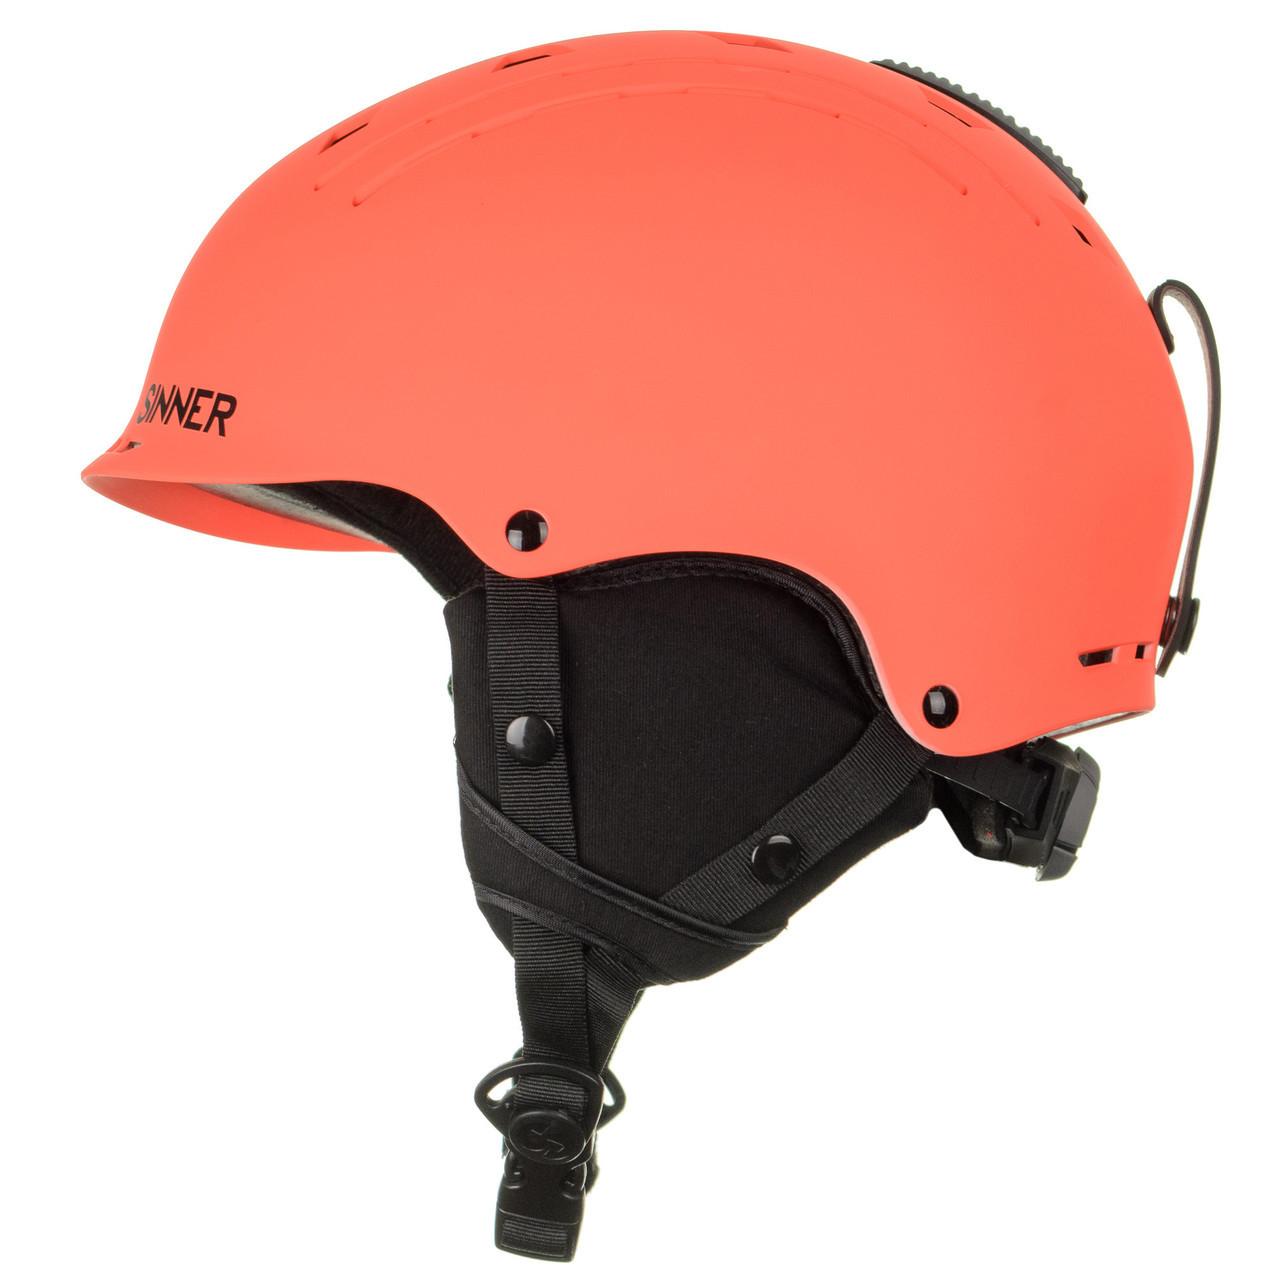 Шолом гірськолижний Sinner Pincher XS Matte Neon Orange (SIHE-136-60Z-54)